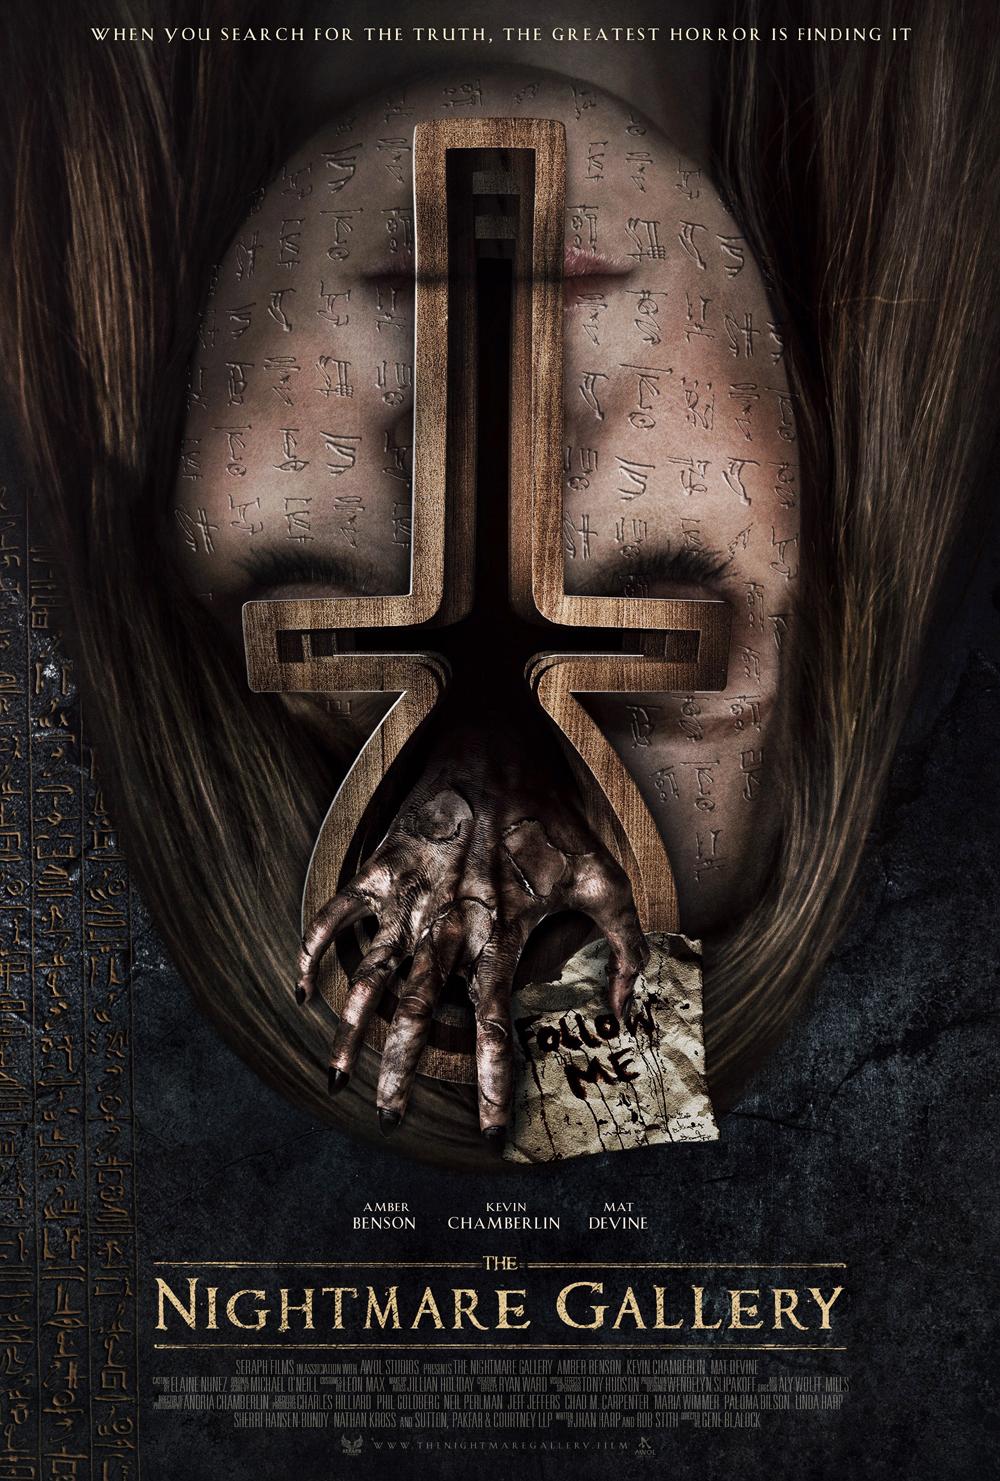 Nightmare Gallery Poster, Amber Benson